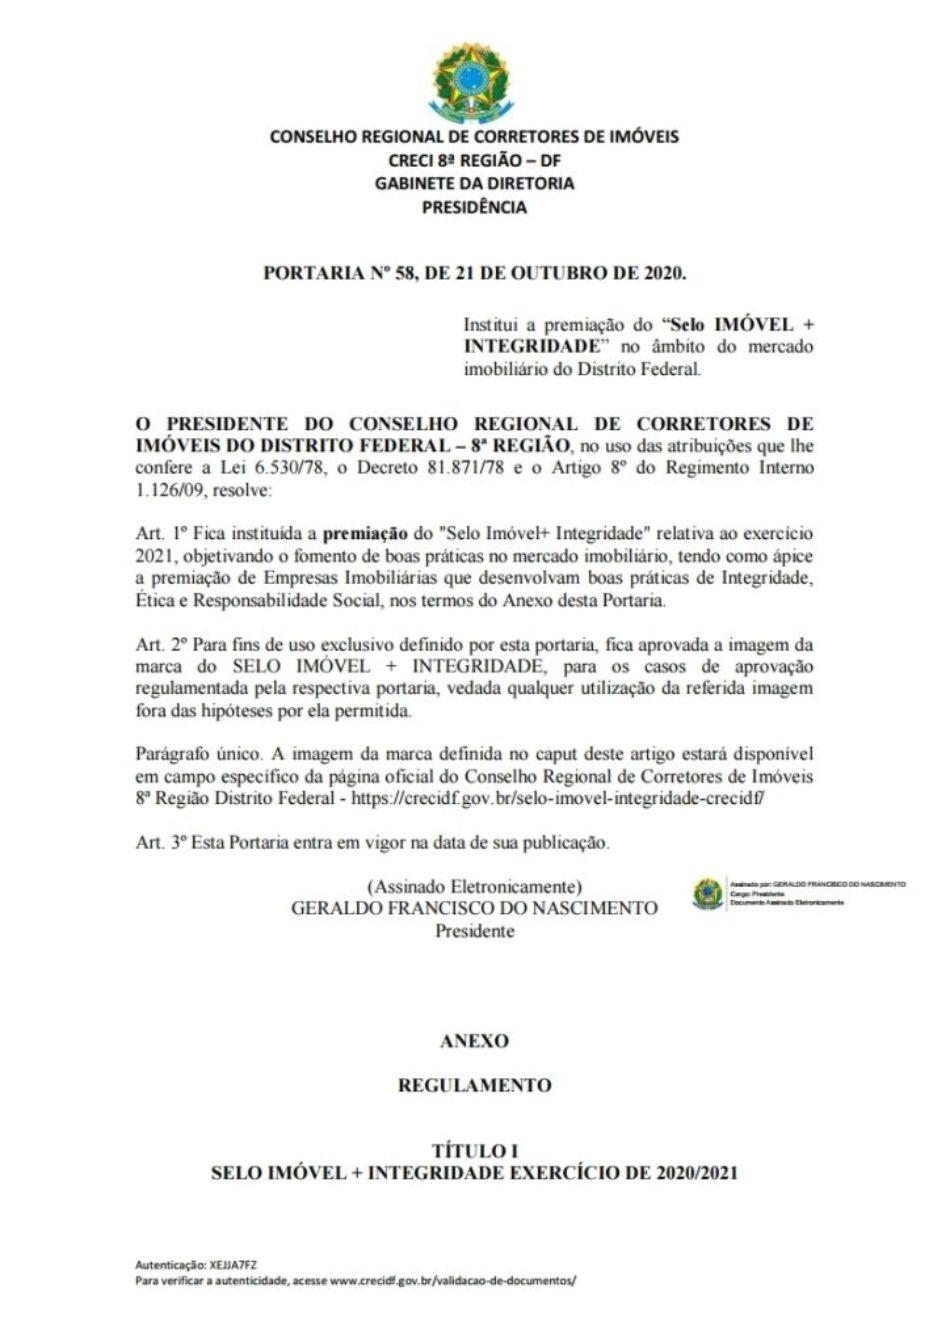 PORTARIA Nº 58 - SELO FINAL_01 (1)